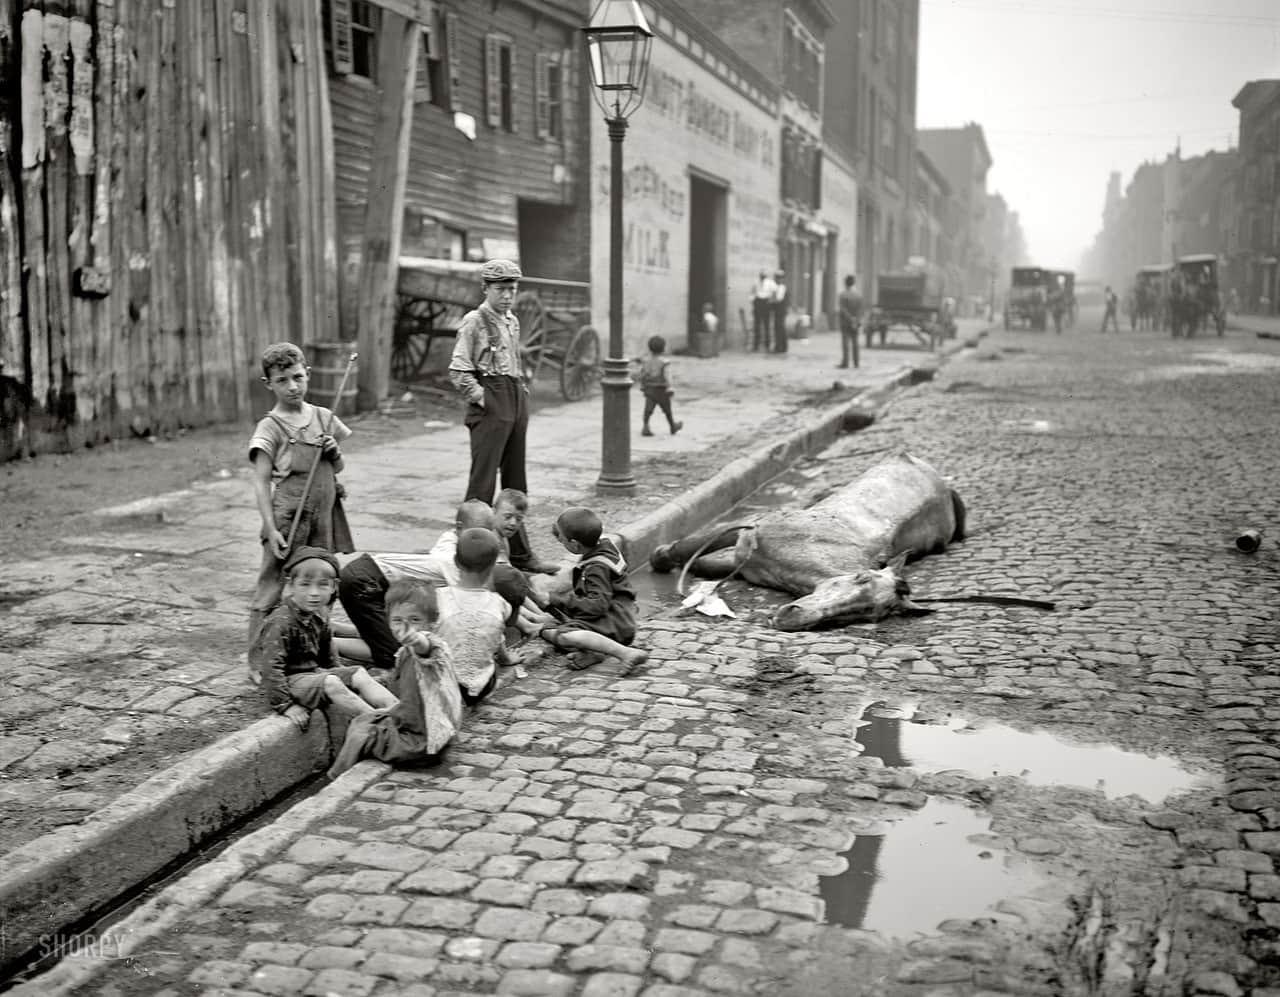 Dead horse left in the gutter, ca 1900